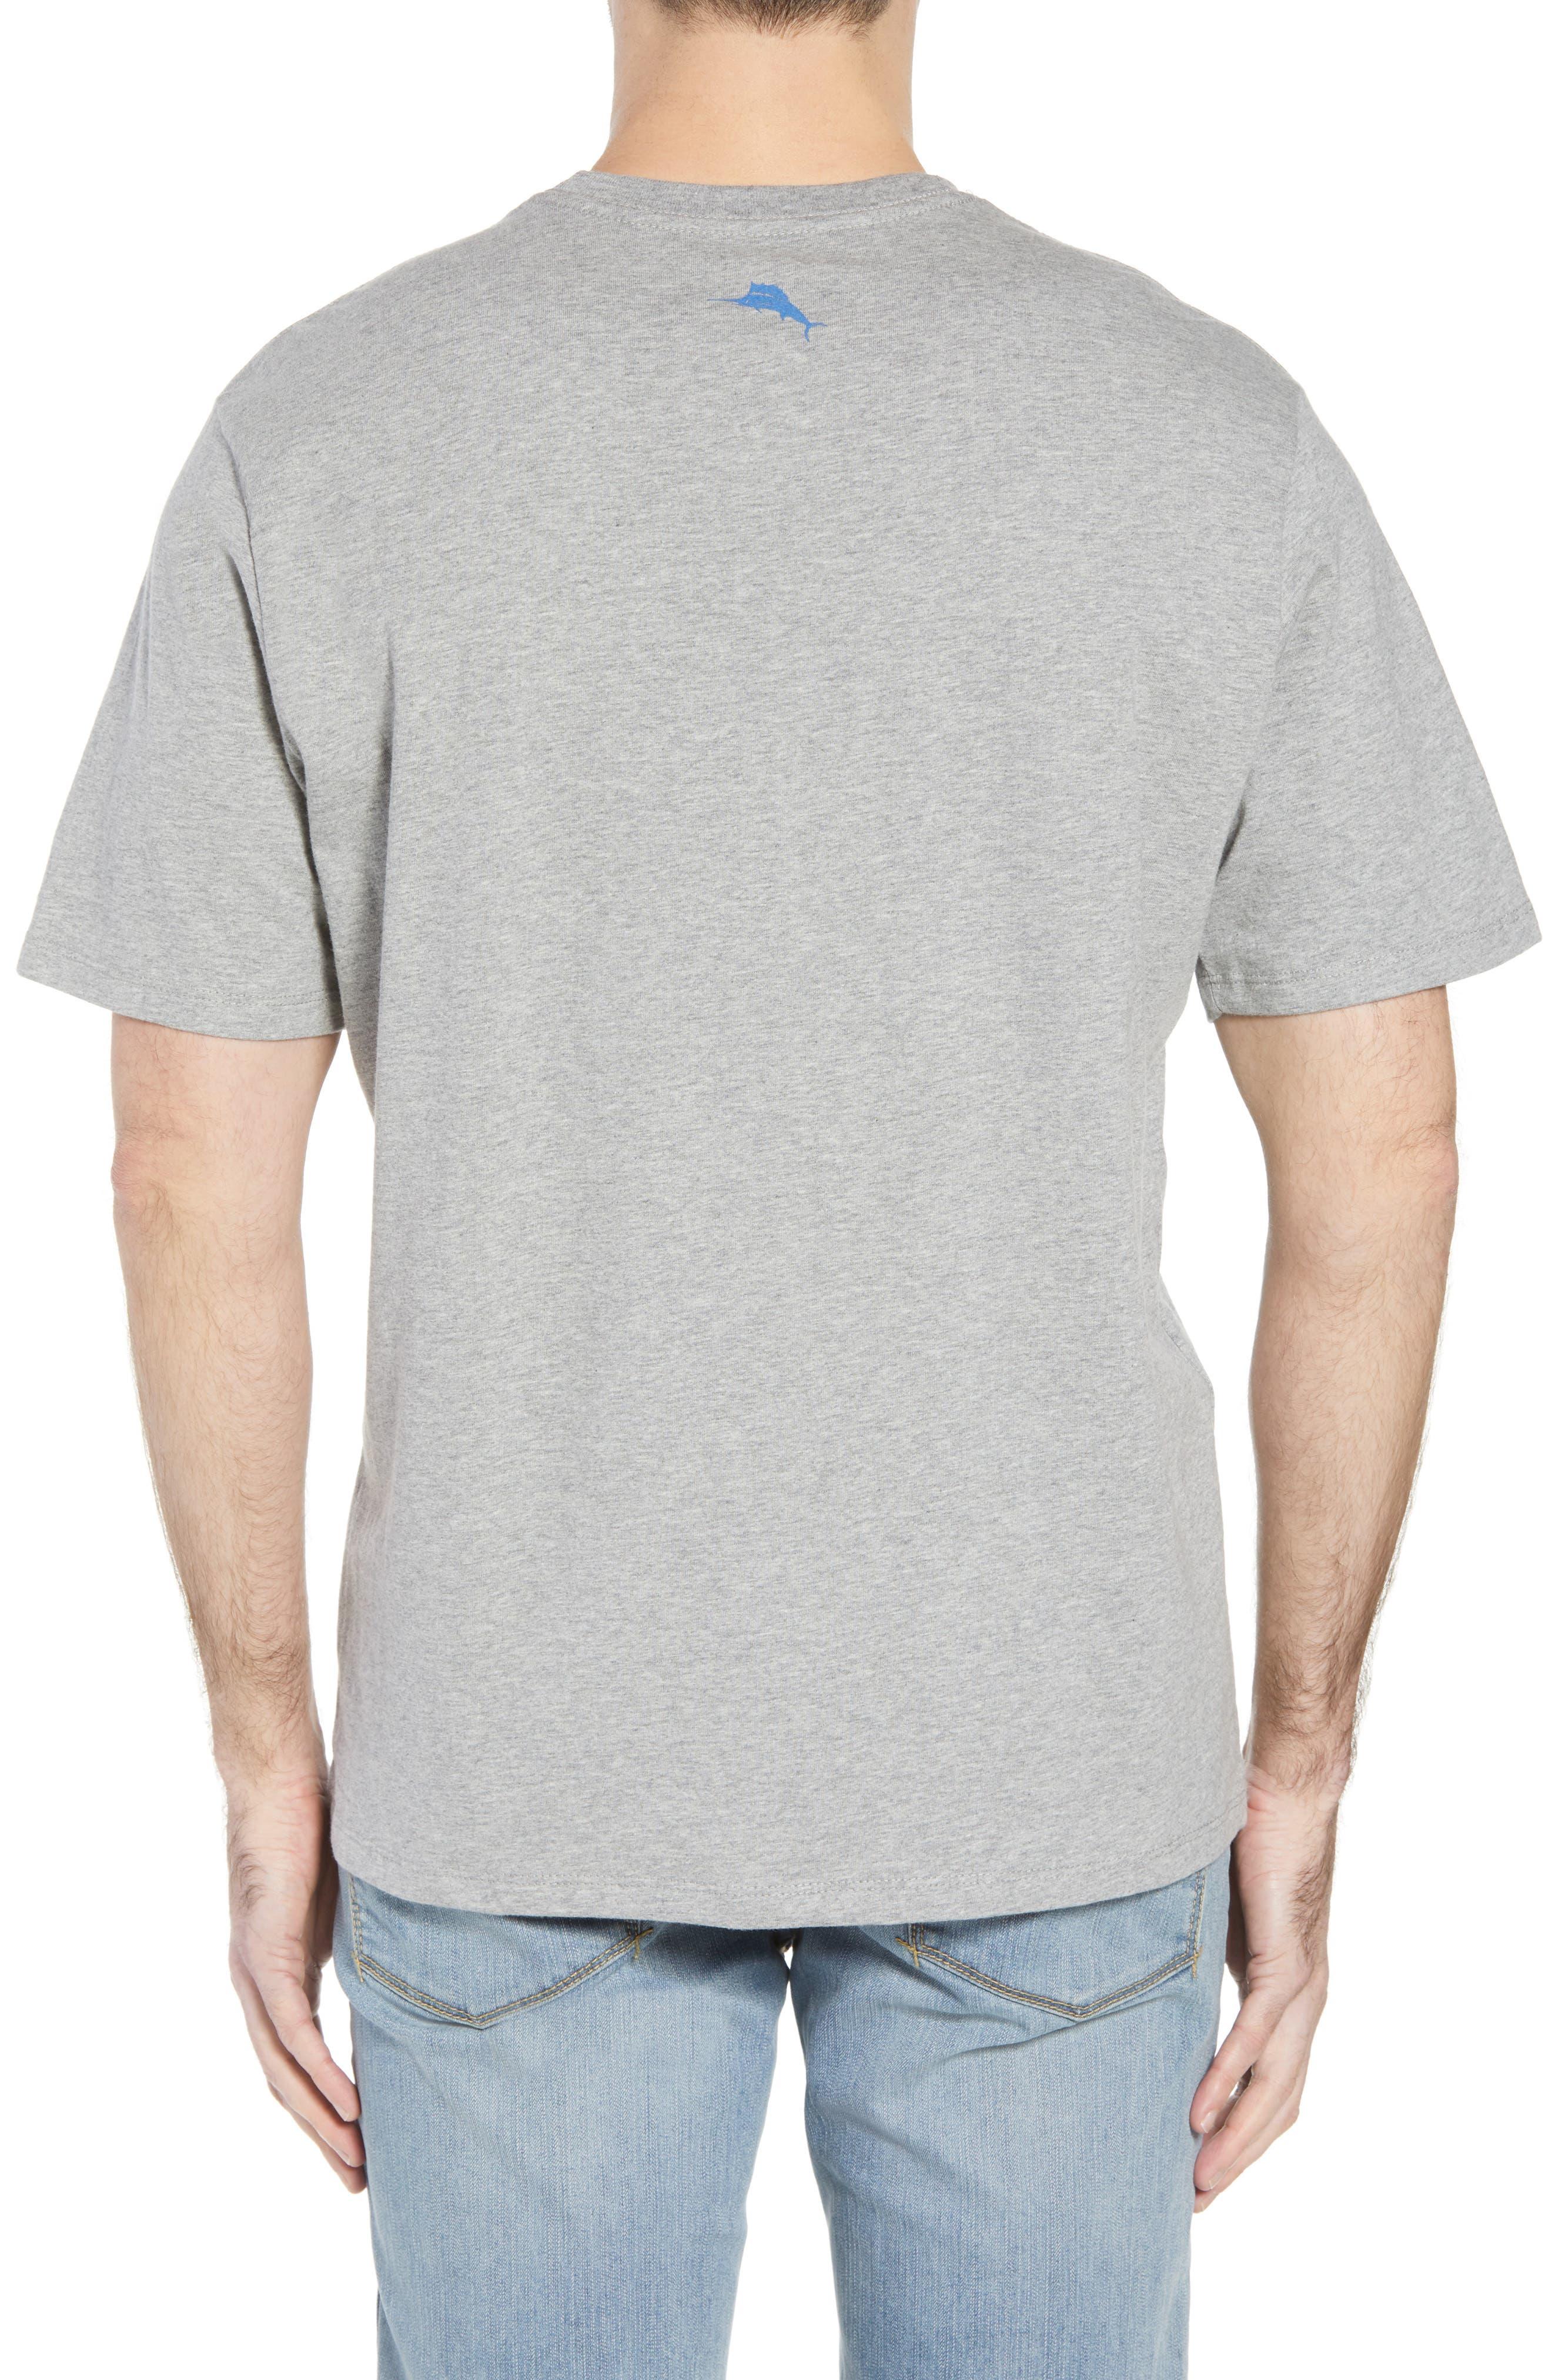 Bourbon of Proof Graphic T-Shirt,                             Alternate thumbnail 2, color,                             050